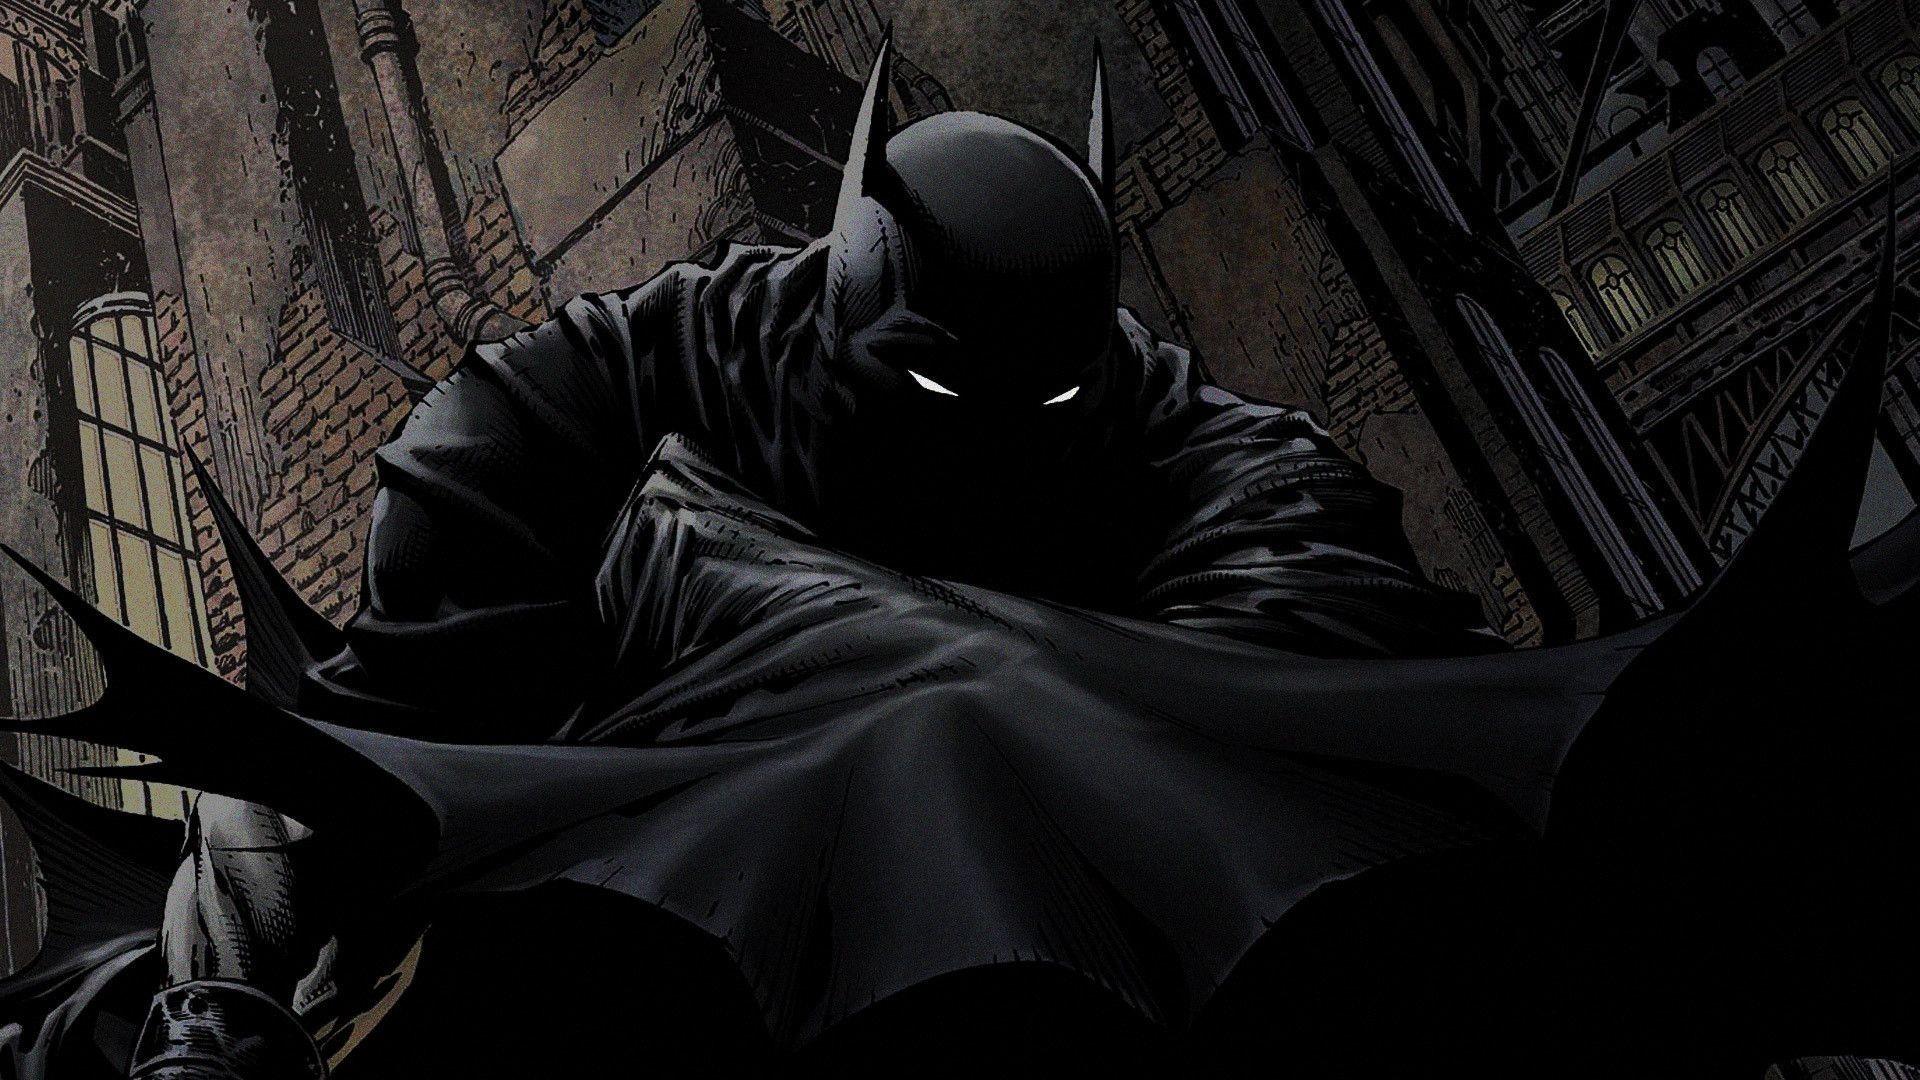 Dc Comics Batman Wallpapers HD Resolution with HD Wallpaper Resolution